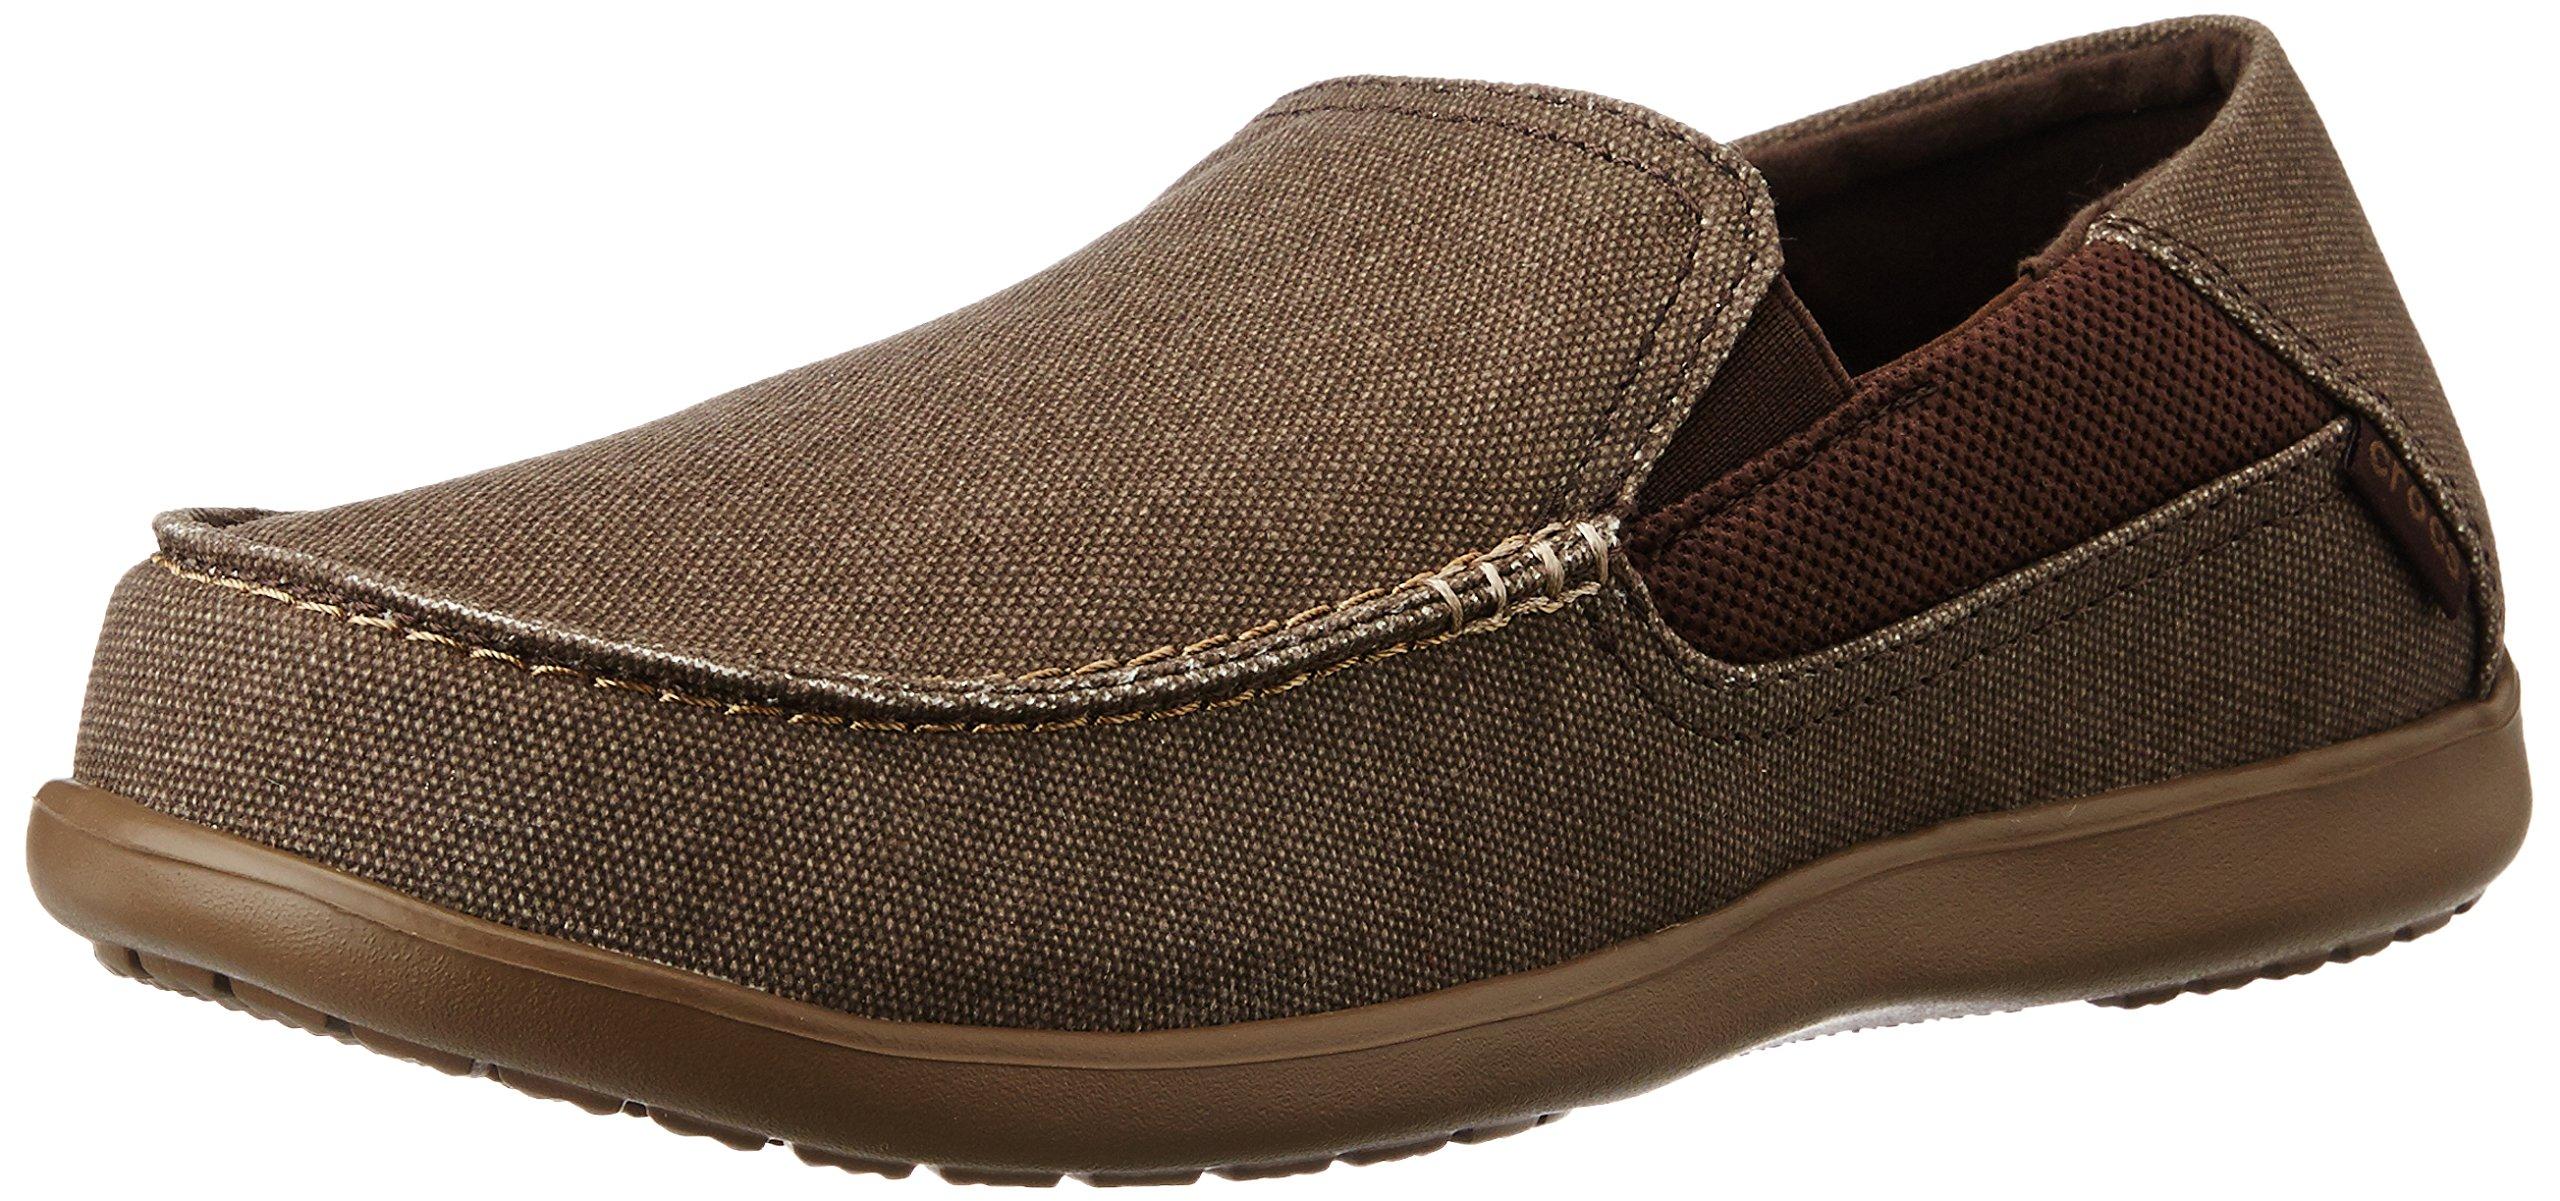 Crocs Men's Santa Cruz 2 Luxe M Slip-On Loafer, Espresso/Walnut, 11 M US